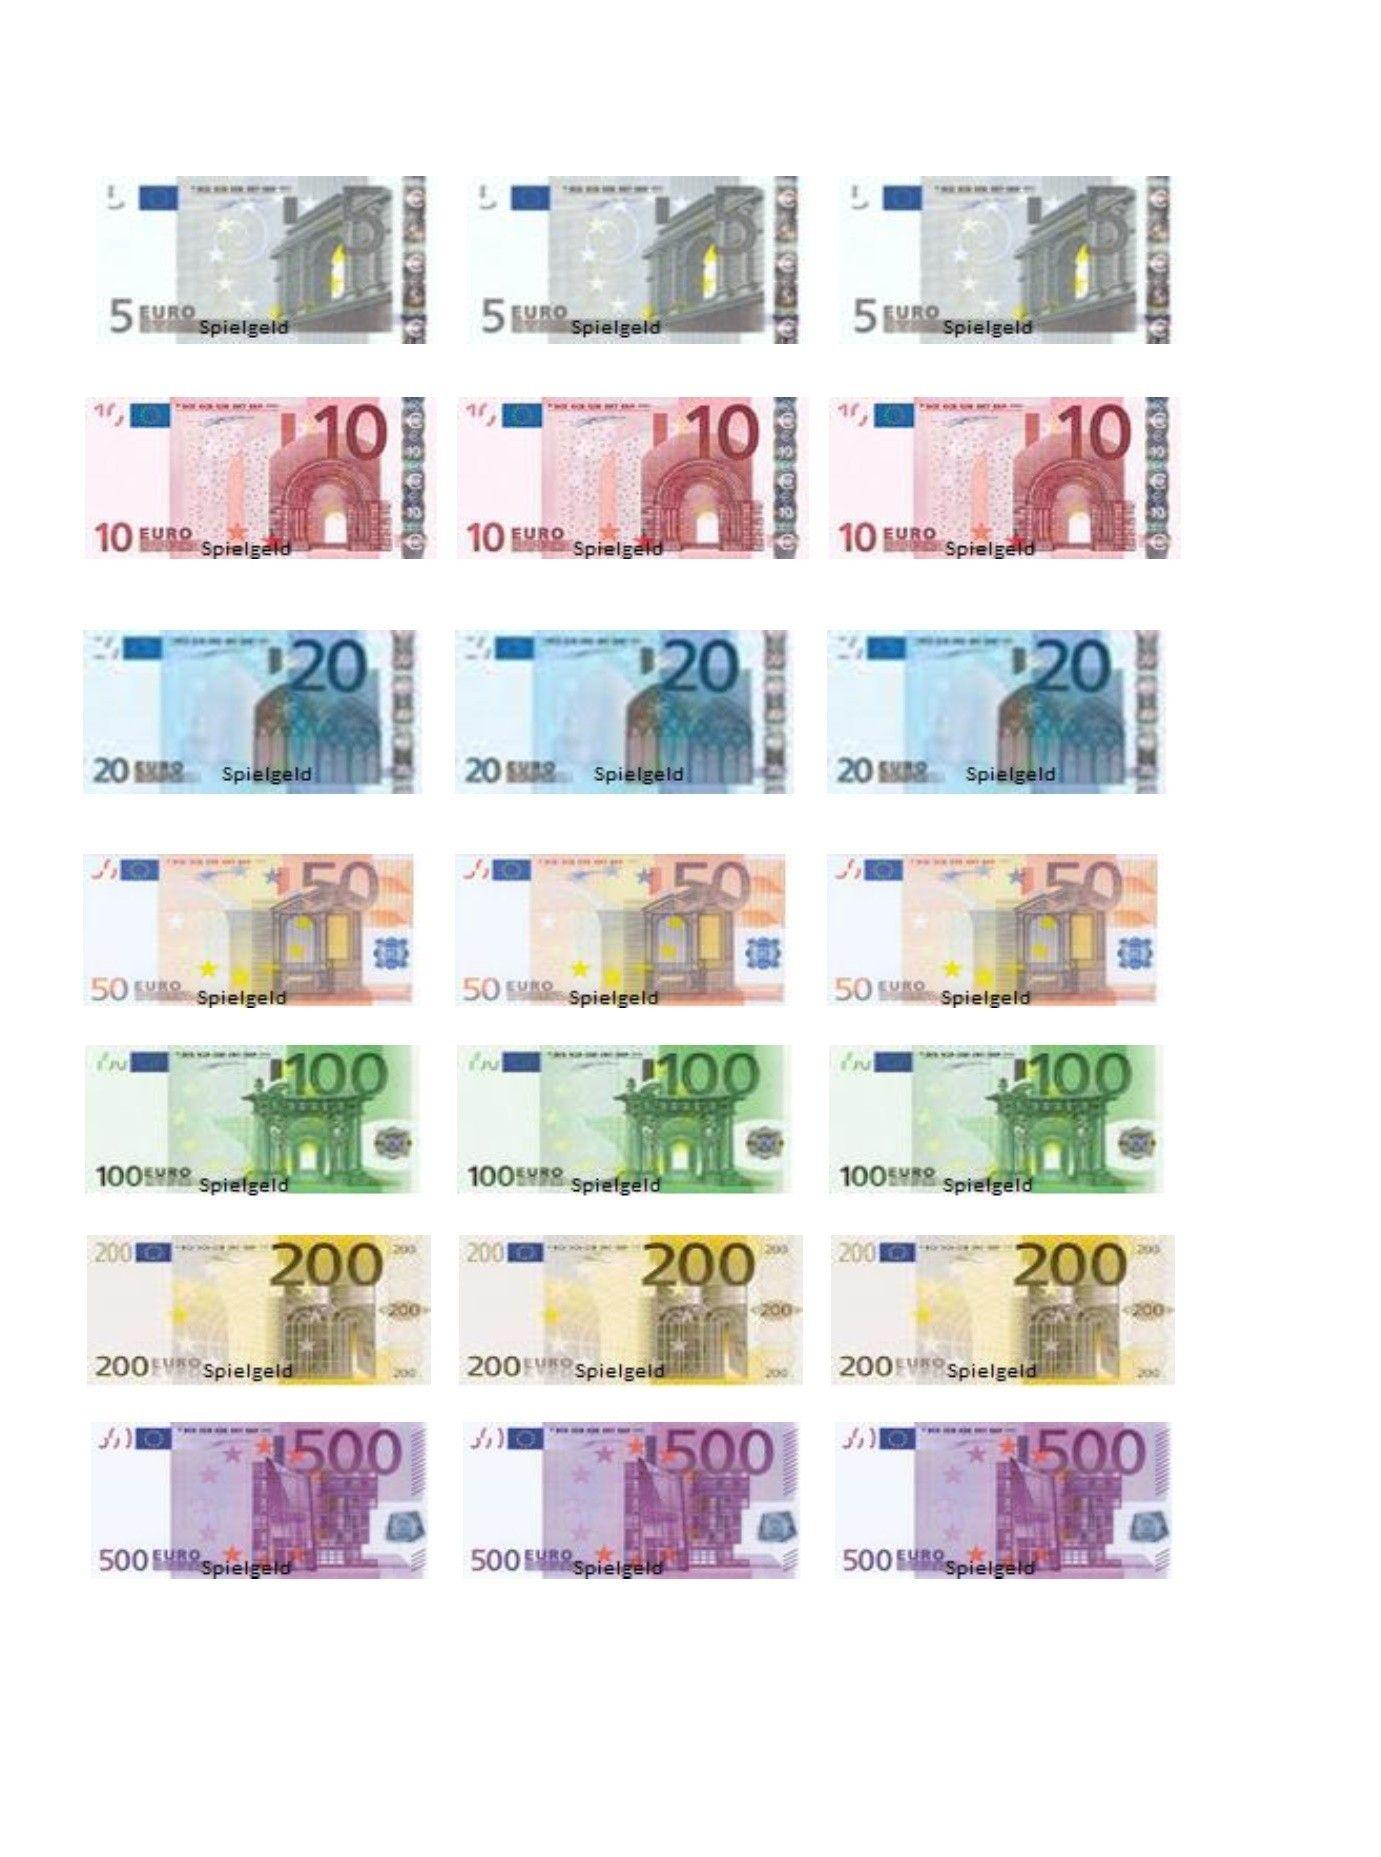 Pokerstars virtual money